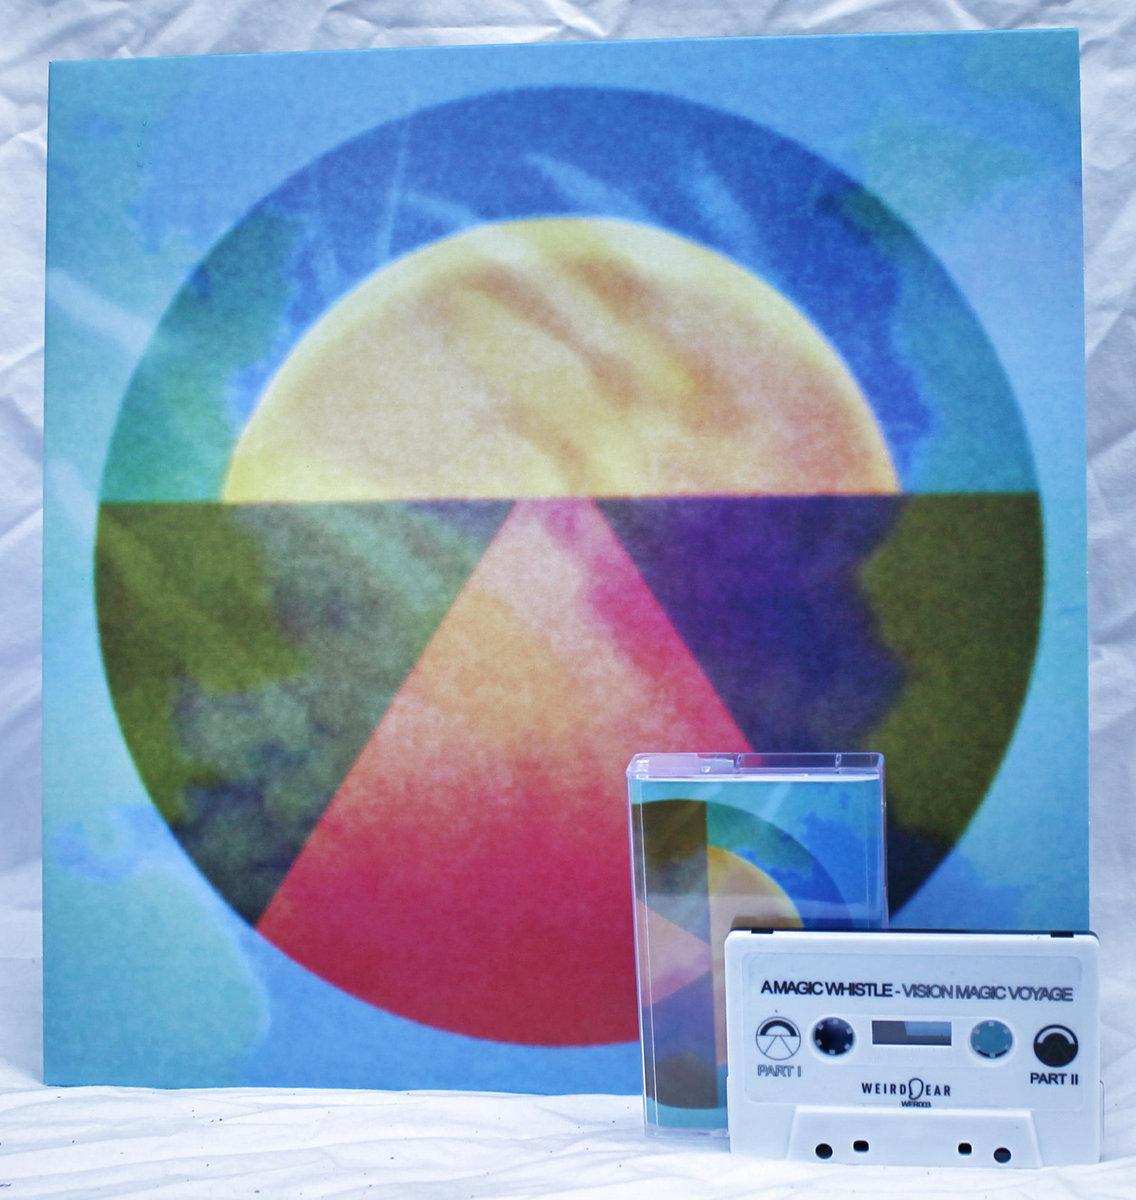 Vision Magic Voyage | Weird Ear Records